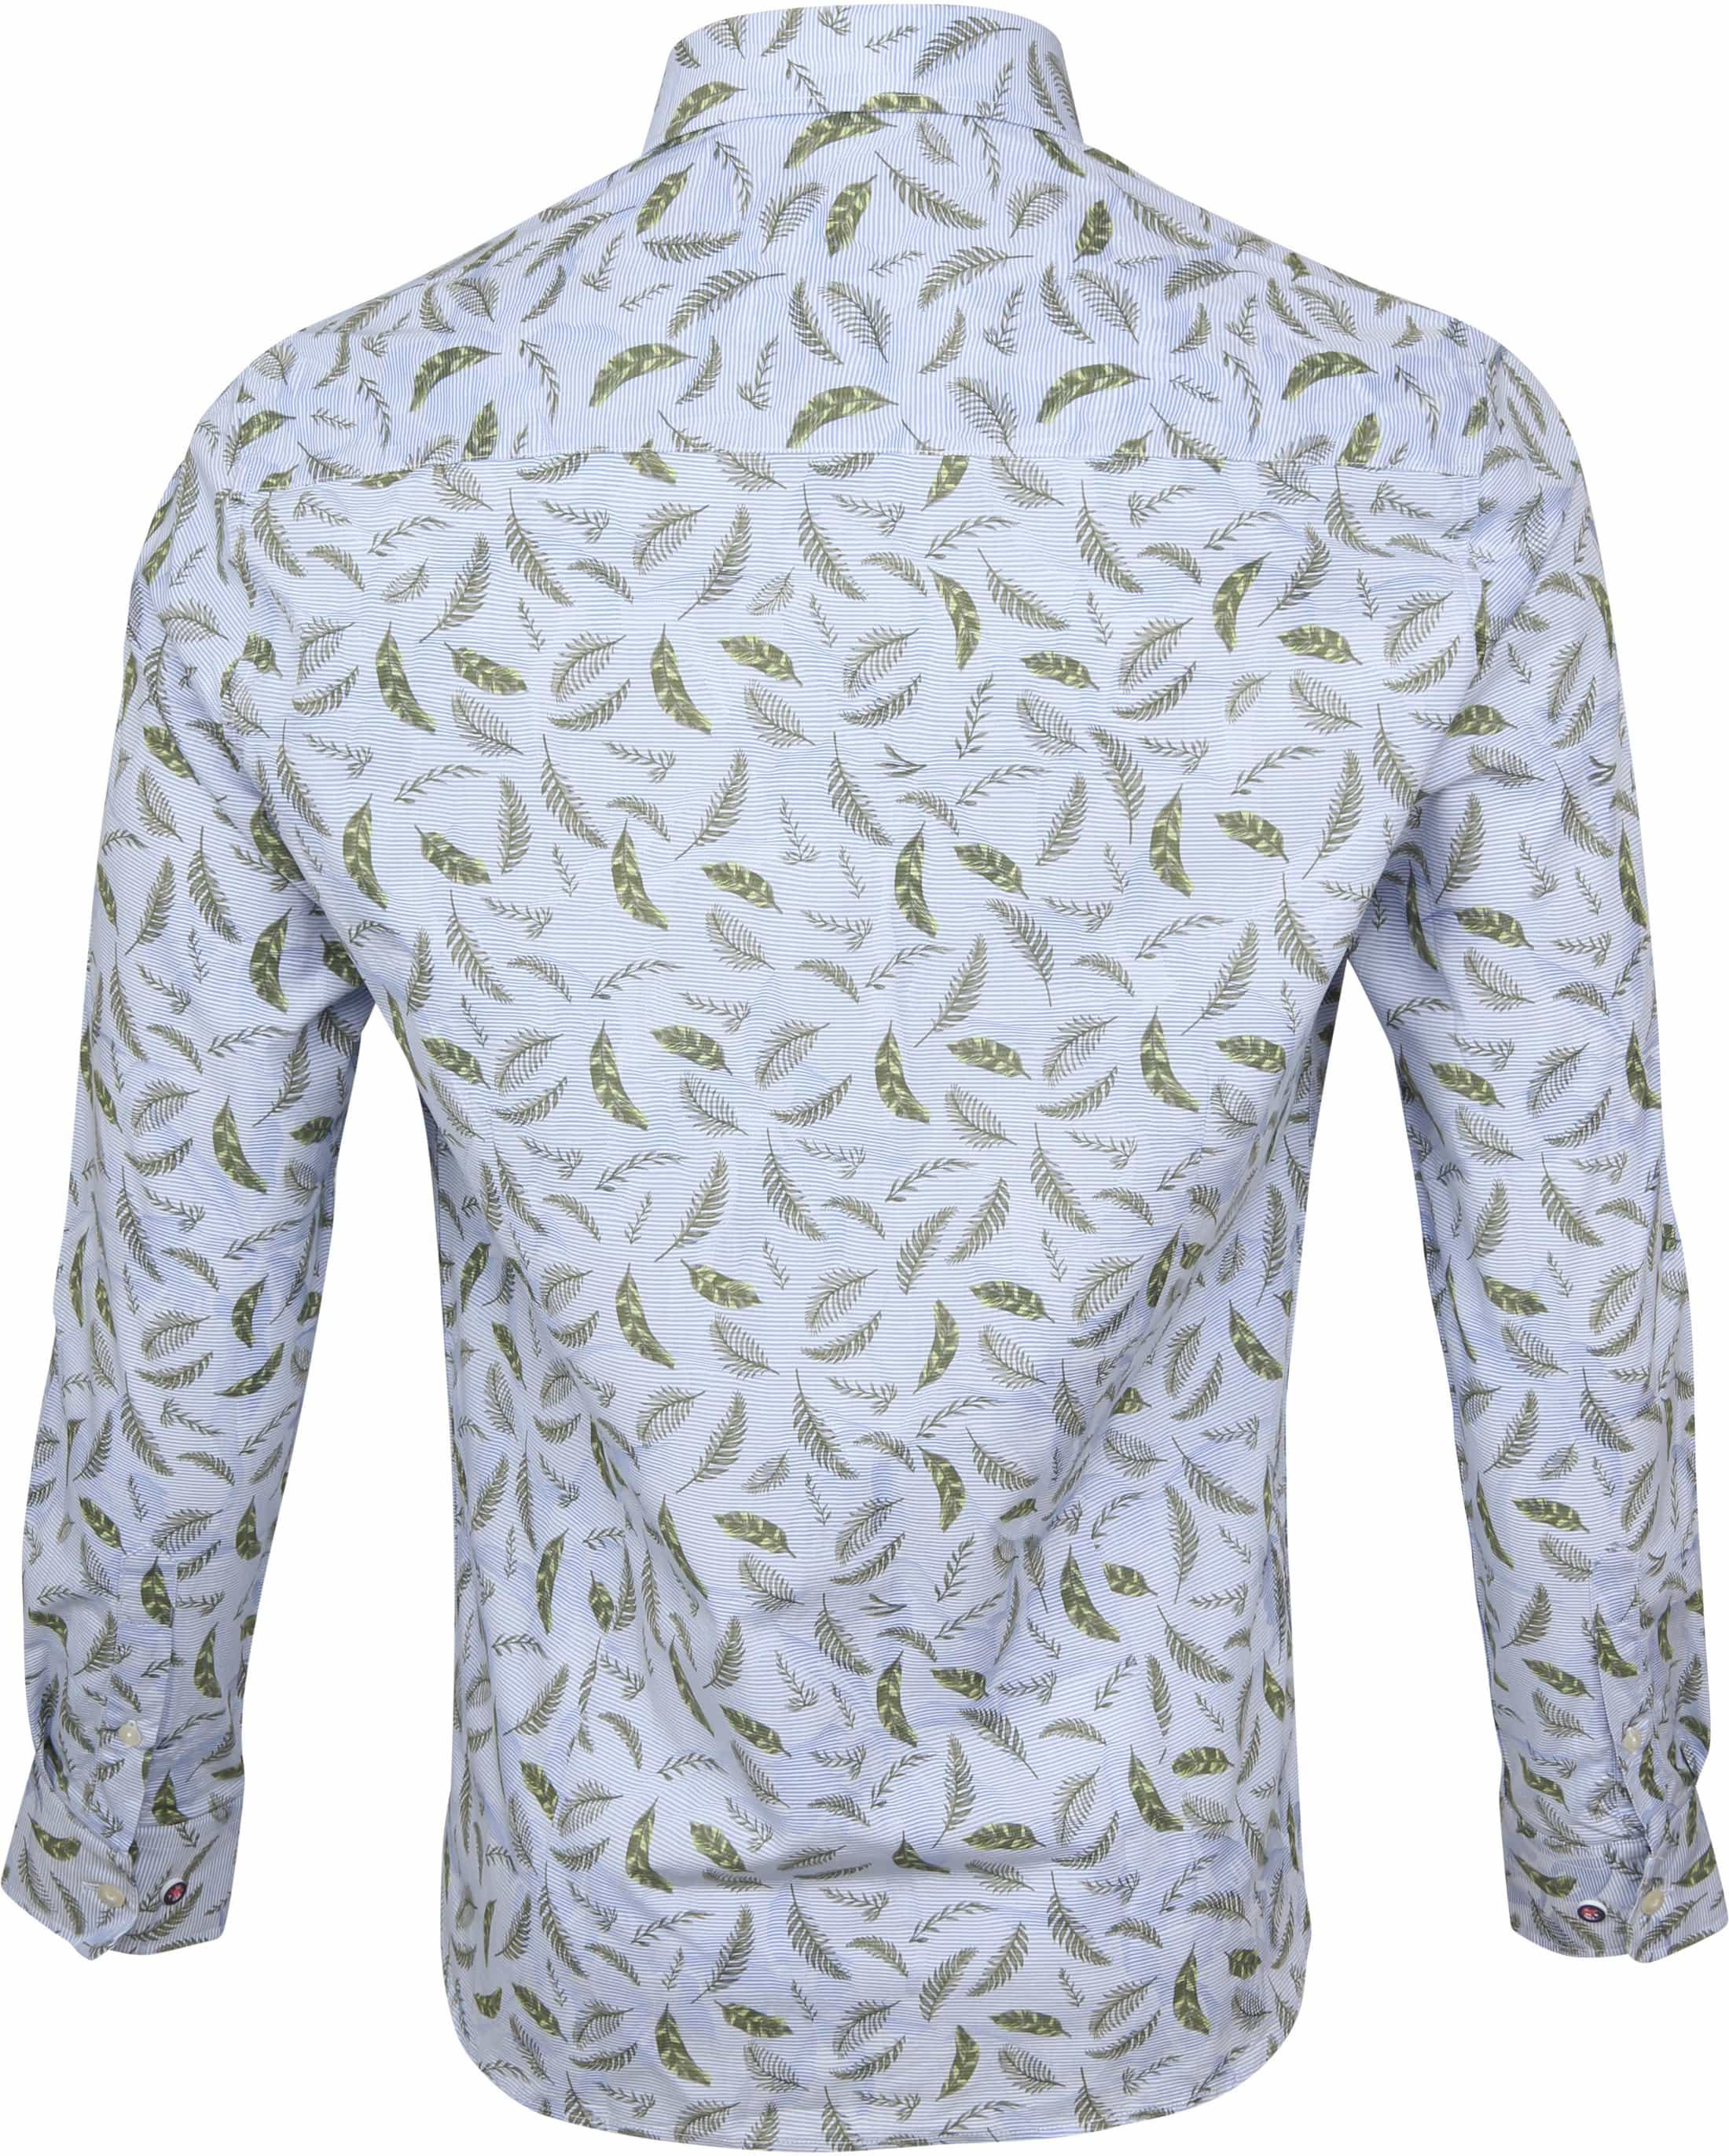 NZA Shirt Hauroko foto 3